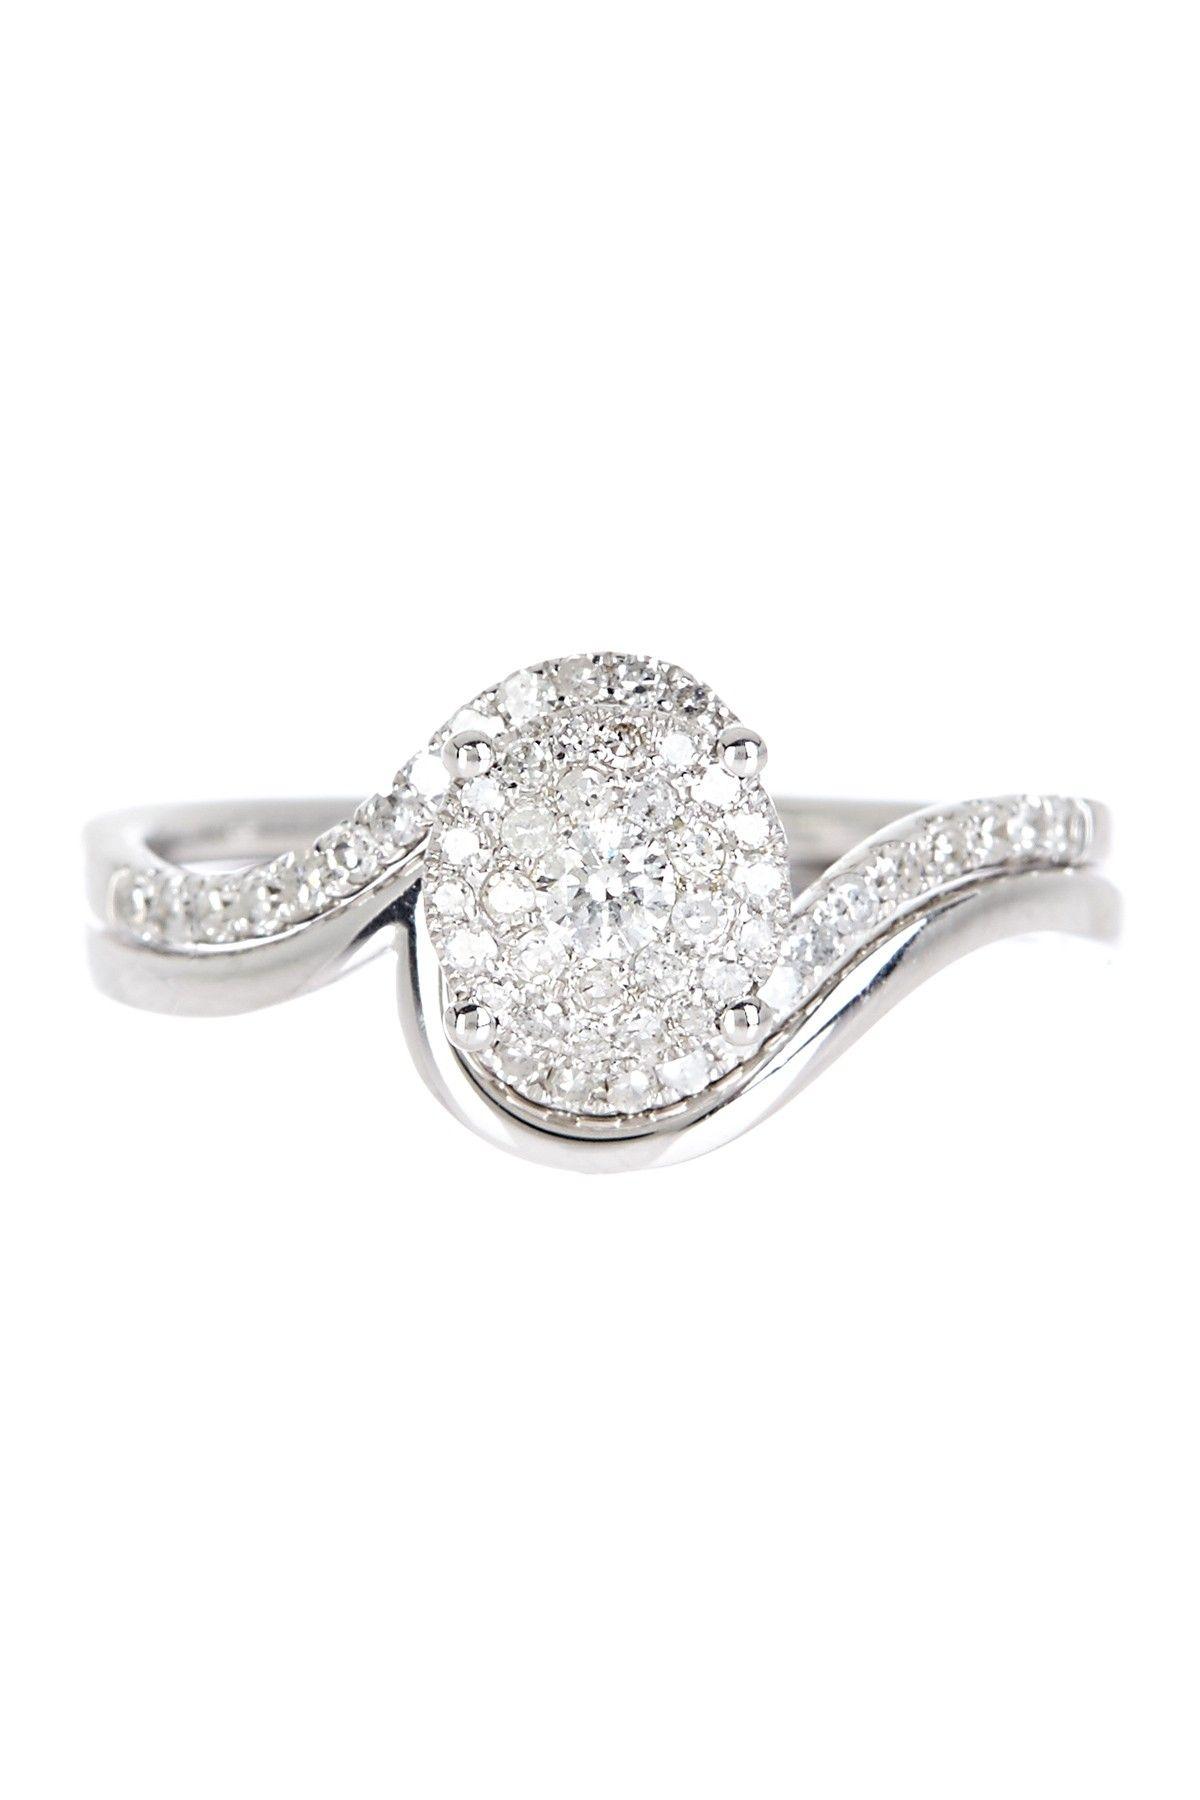 Brilliant 14k White Gold Diamond Ring